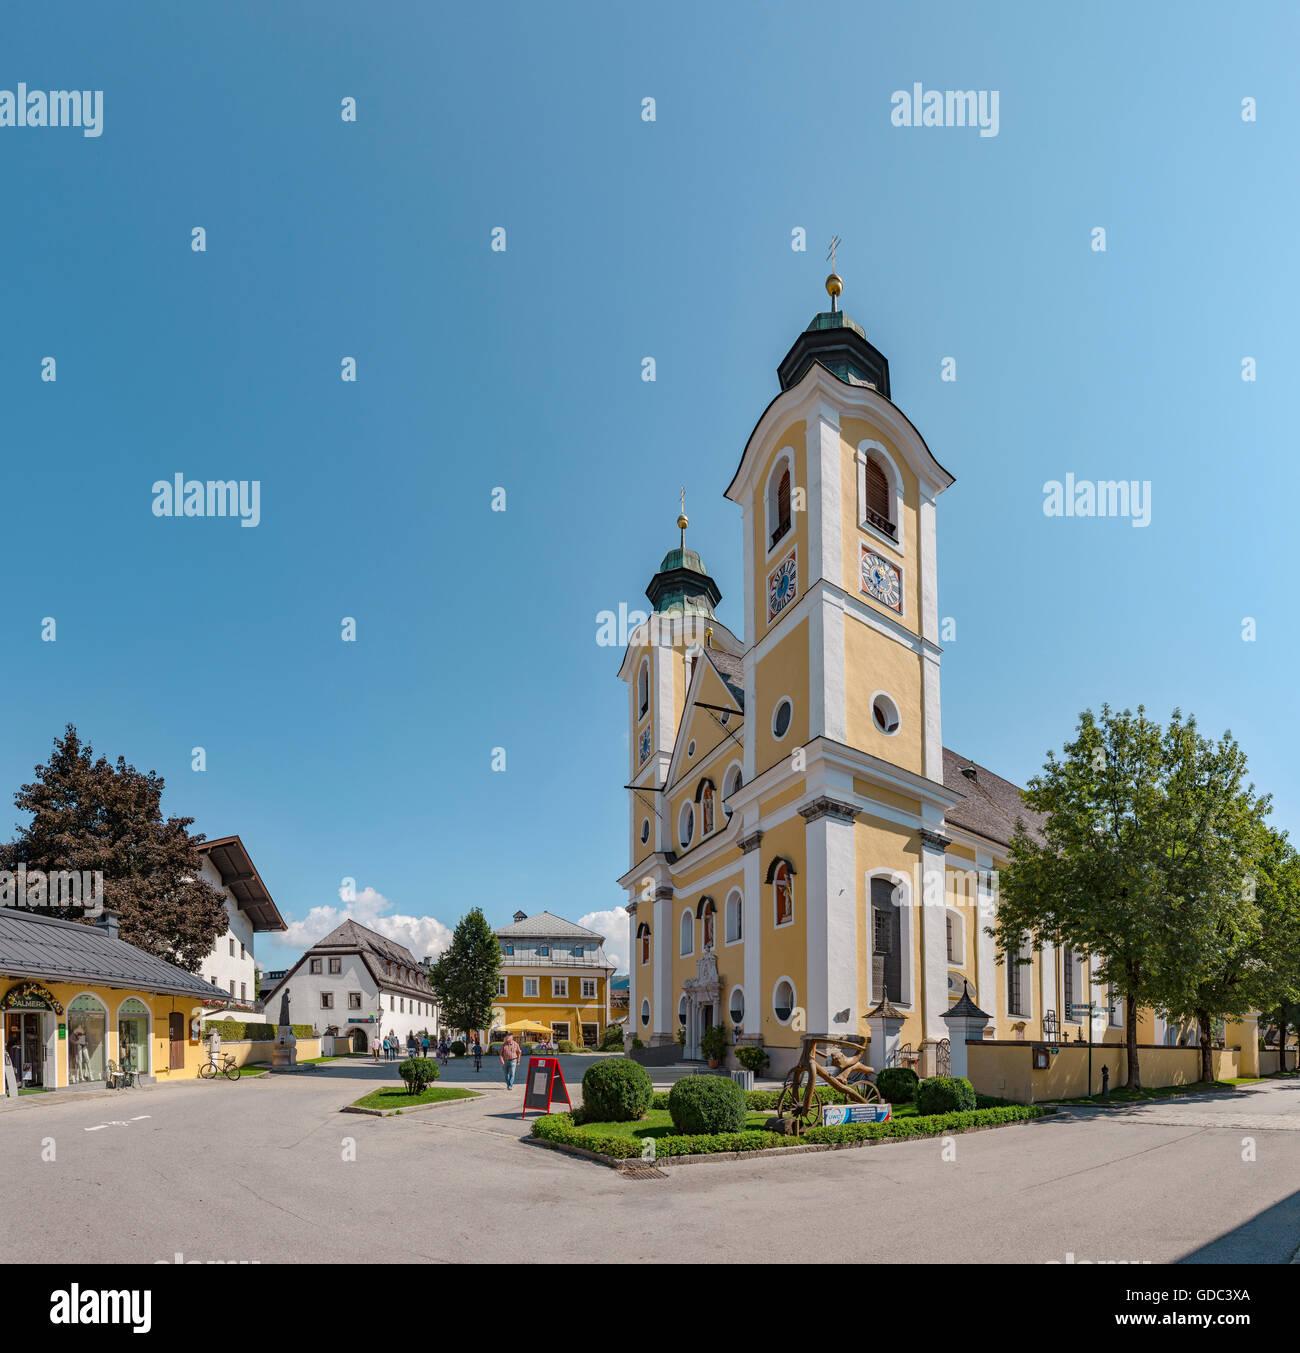 St. Johann in Tirol,Austria,The Dekanatspfarr church at the Hauptplatz - Stock Image